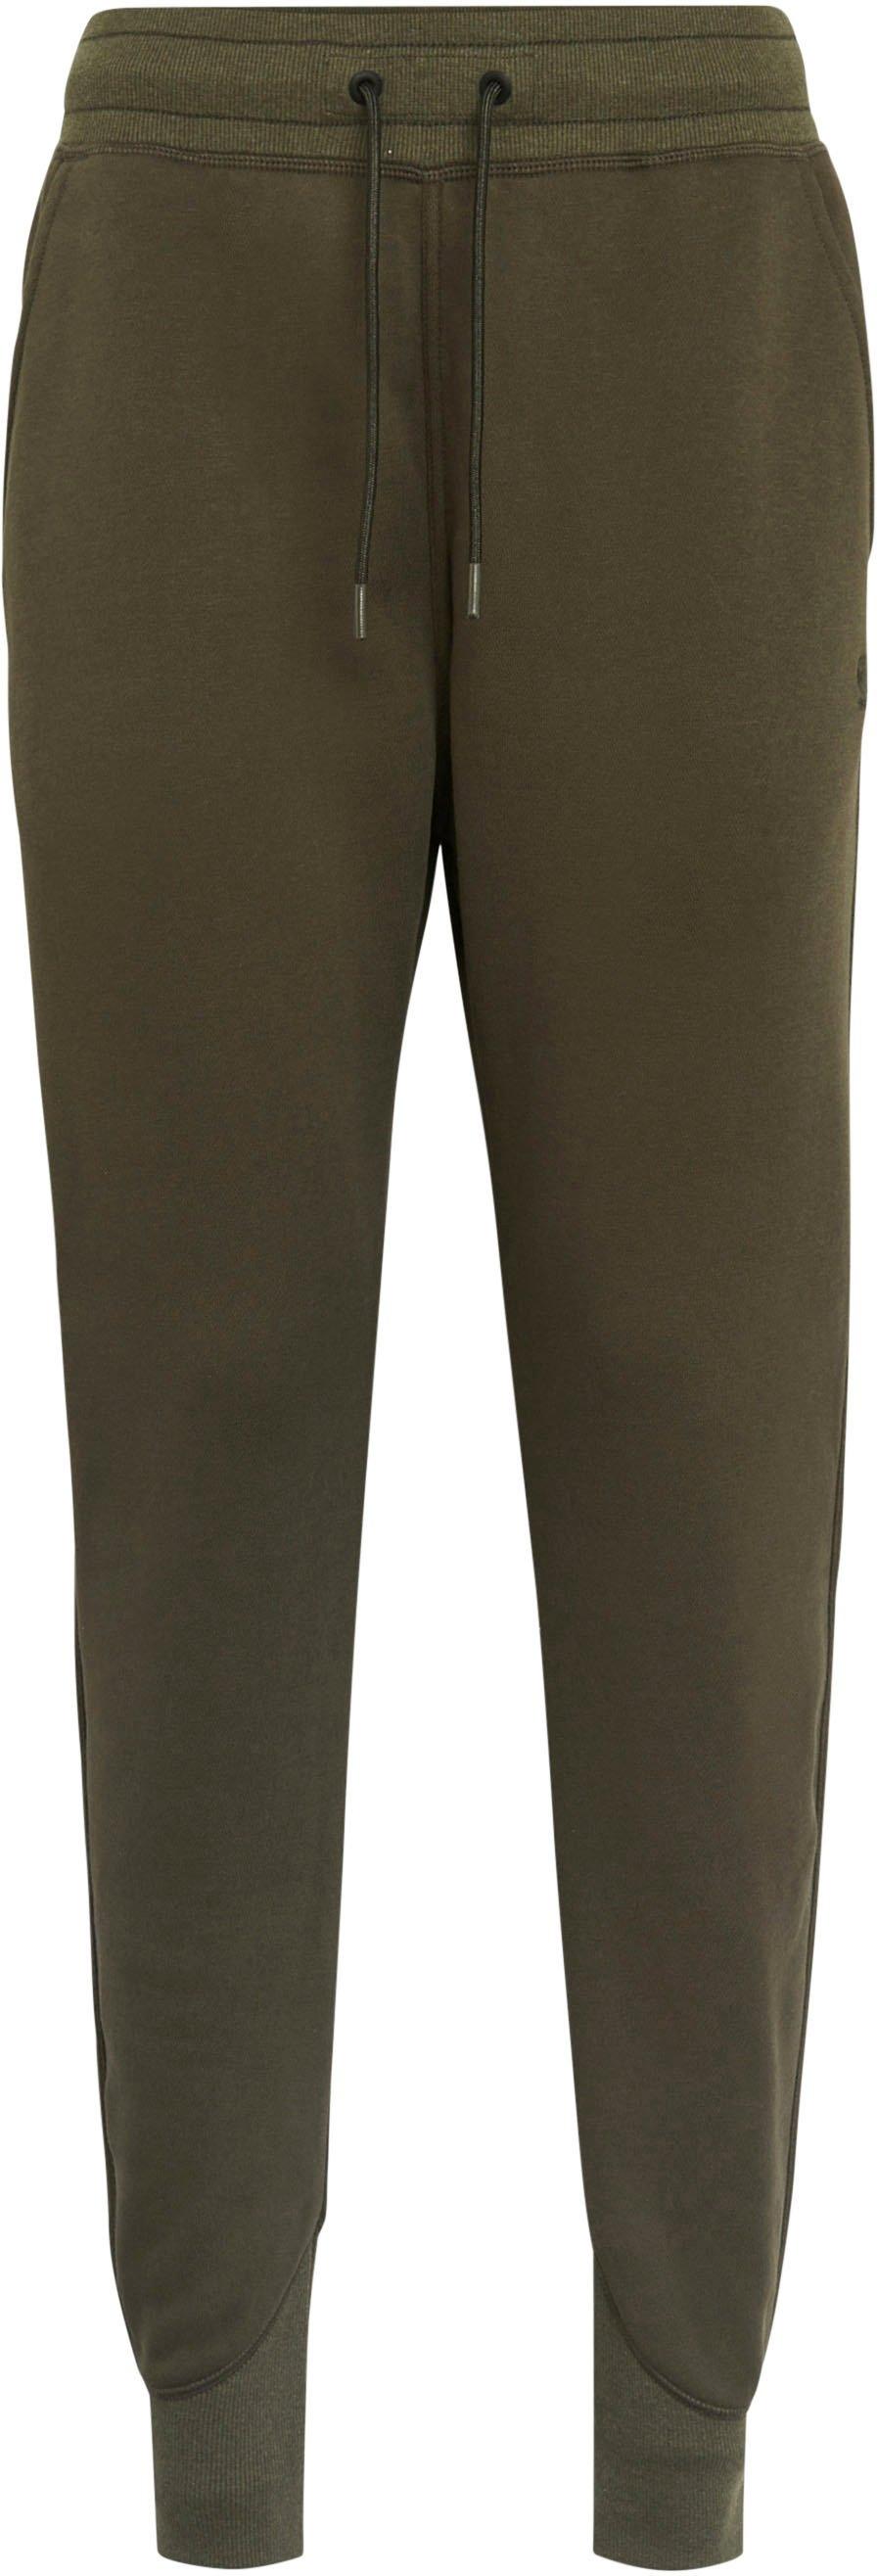 G-Star RAW sweatpants »Premium Core 3D Tapered Sweatpants« - verschillende betaalmethodes